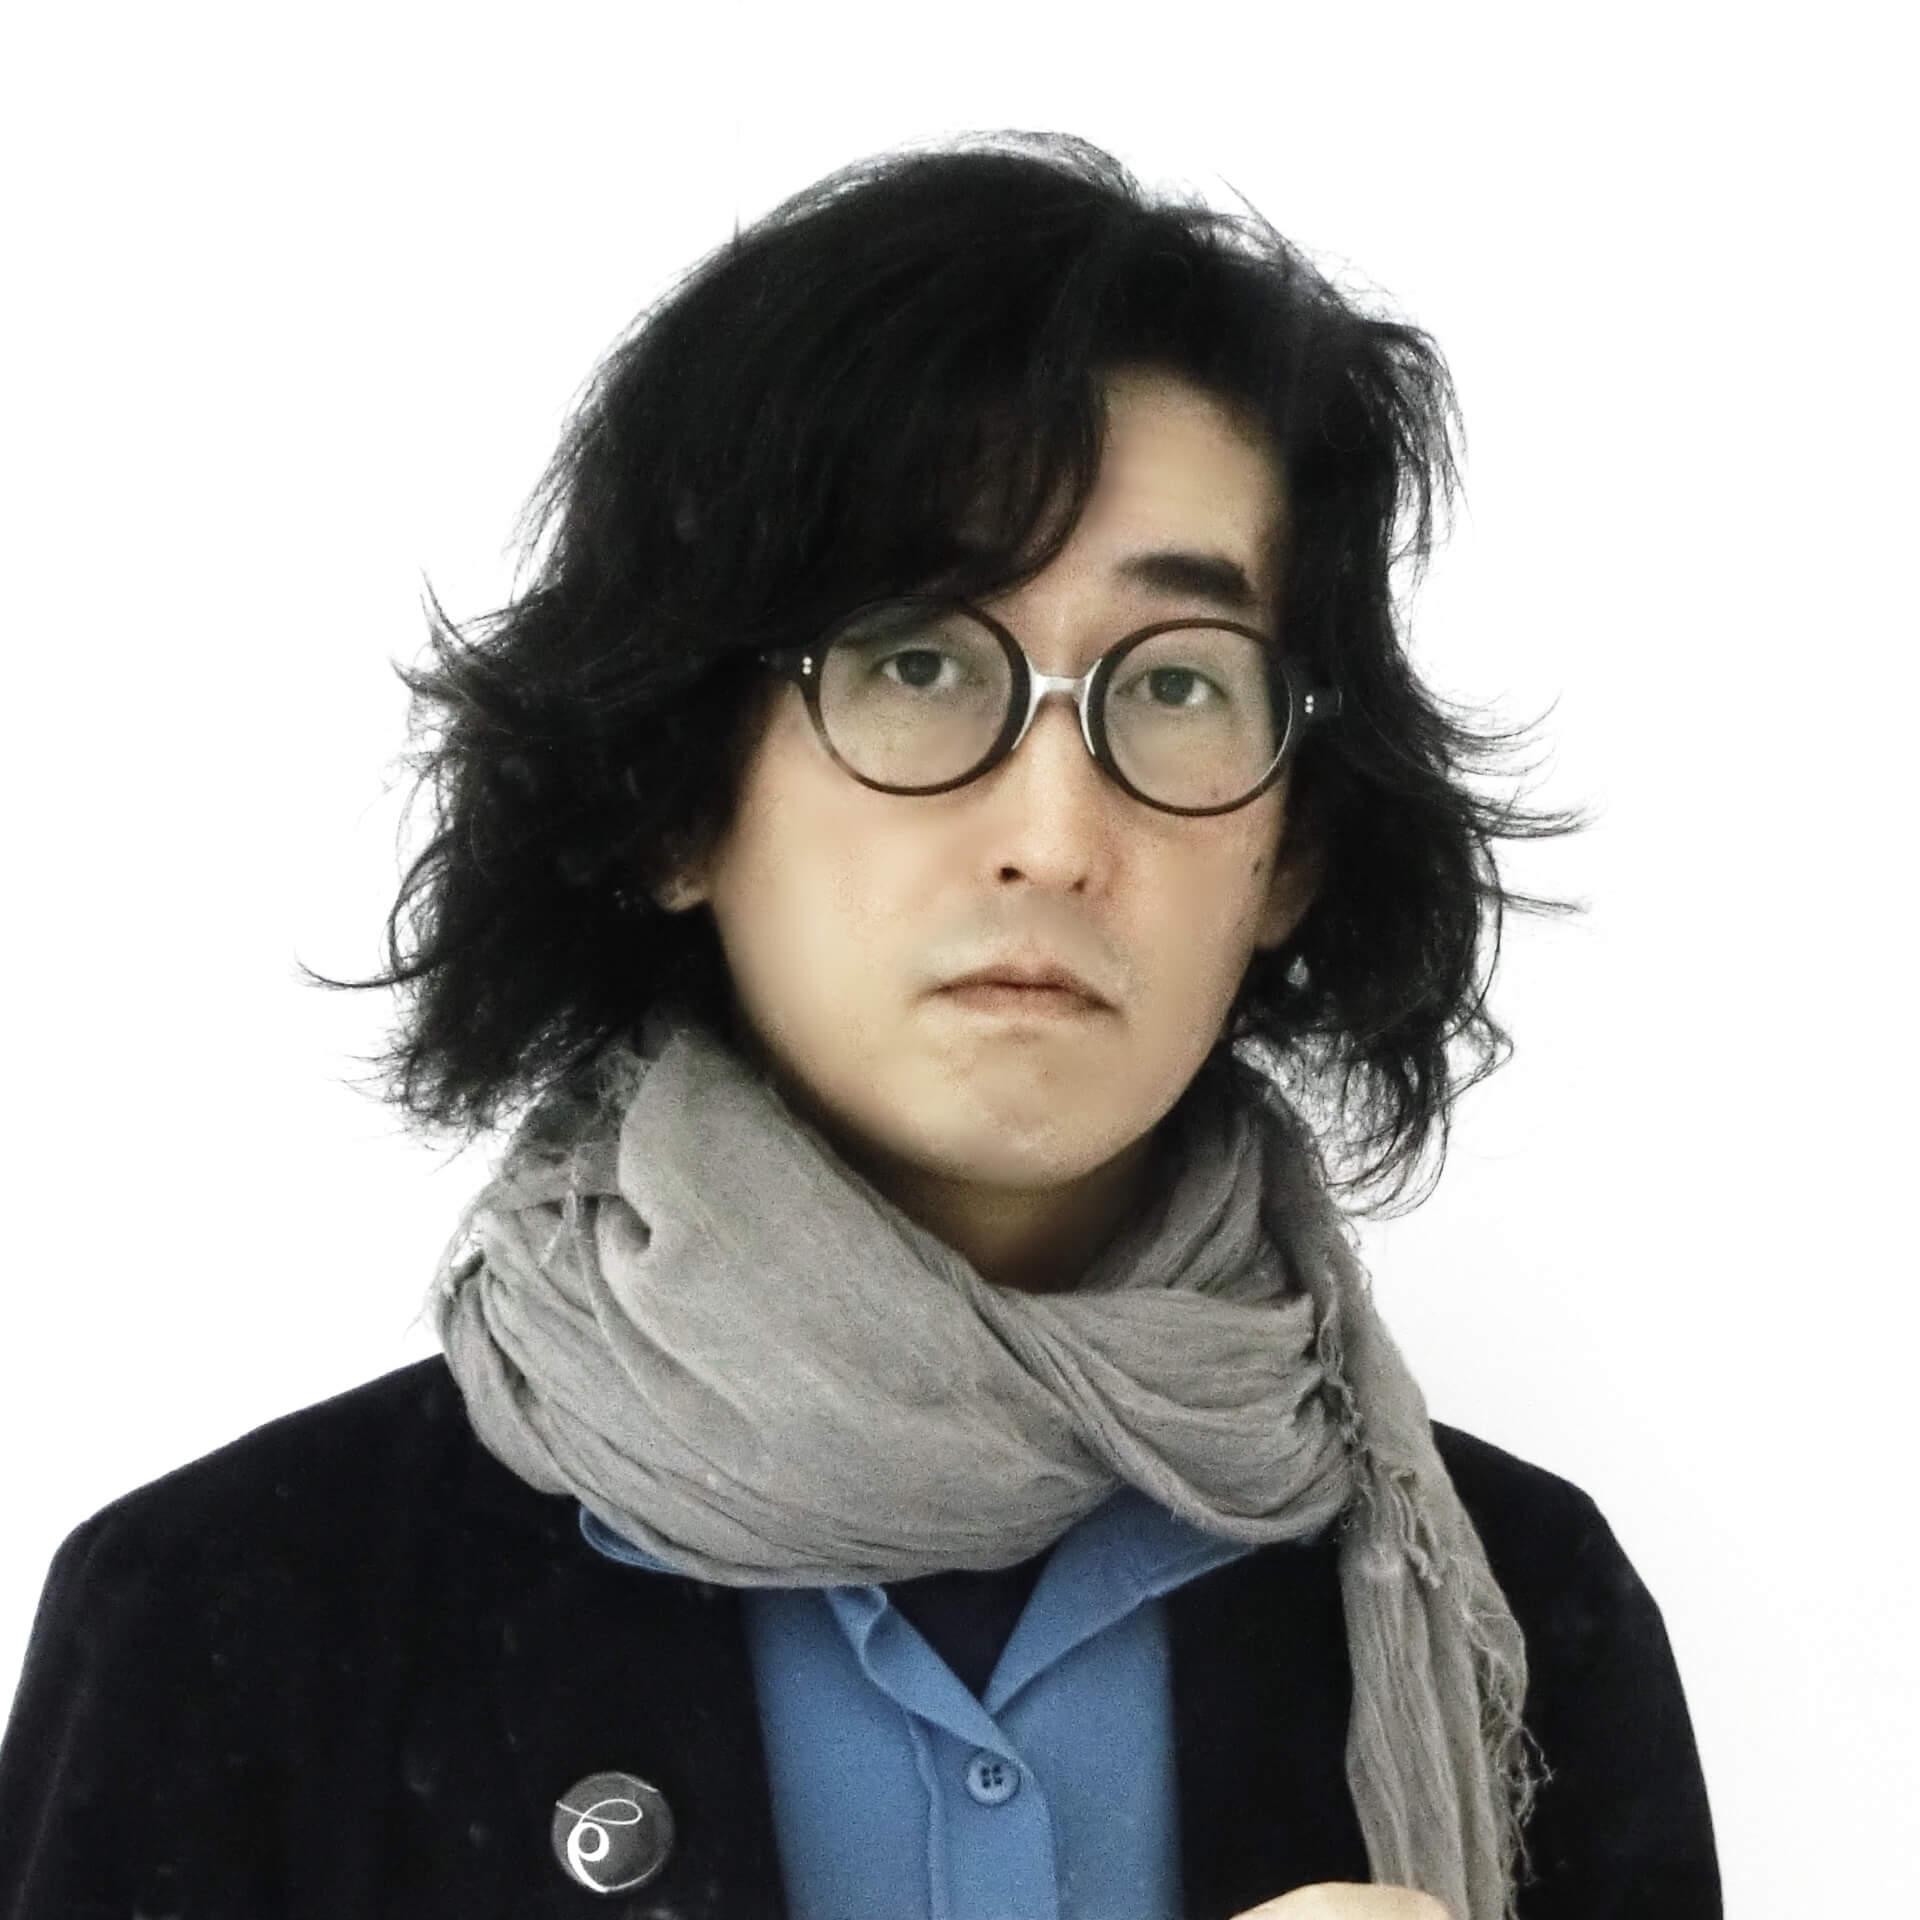 <Japan Media Arts Distributed Museum ETERNAL ~千秒の清寂>が羽田空港国際線ターミナルで開催!KyokaやTETSUJI OHNOらも作品に参加 ac200127_eternal_04